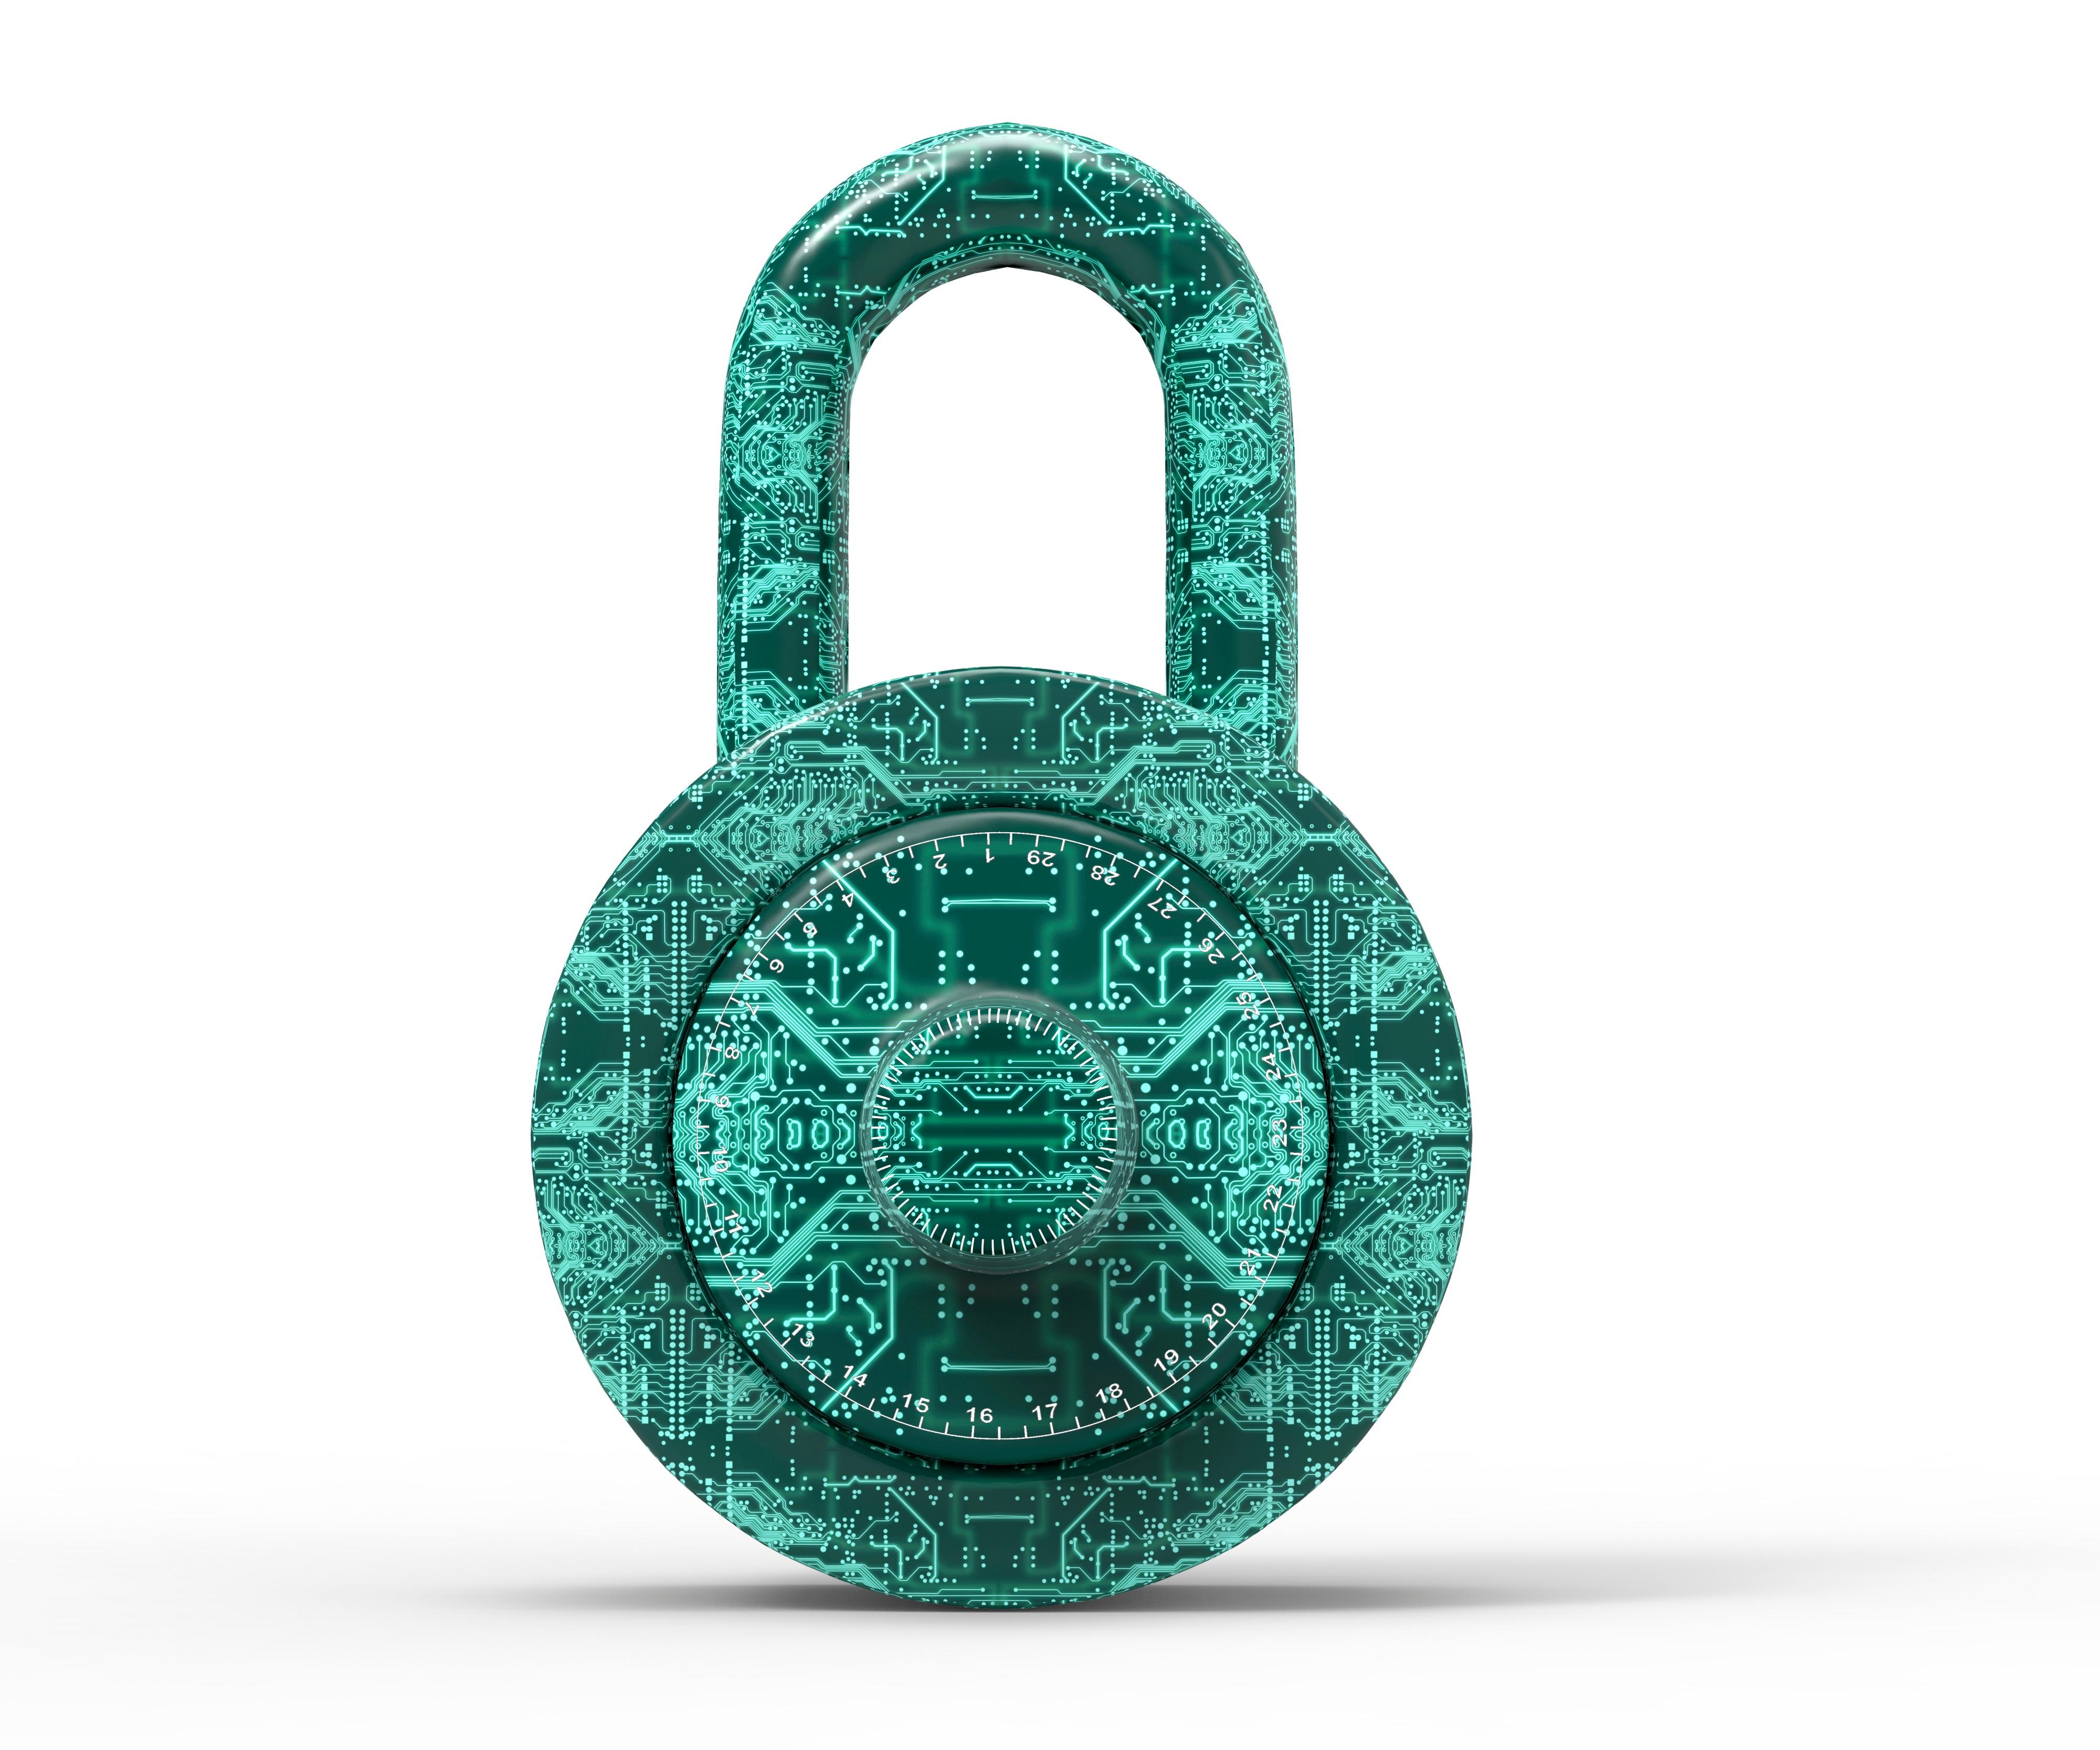 Kyberturvallisuus Gridstream -ratkaisussa